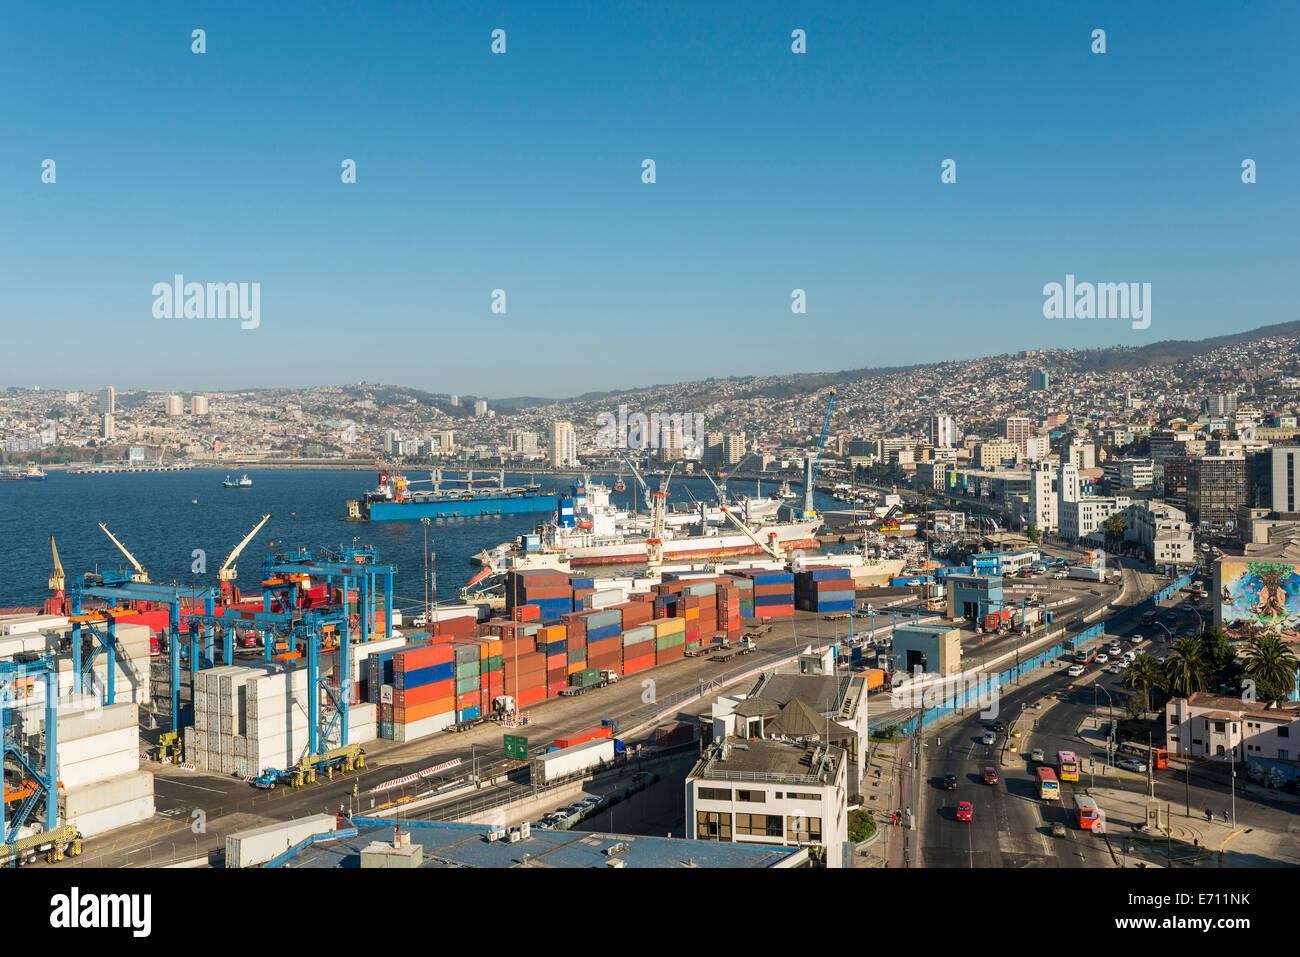 View of city and ports from Paseo 21 de Mayo, Cerro Playa Ancha, Valparaiso, Central Coast, Chile - Stock Image